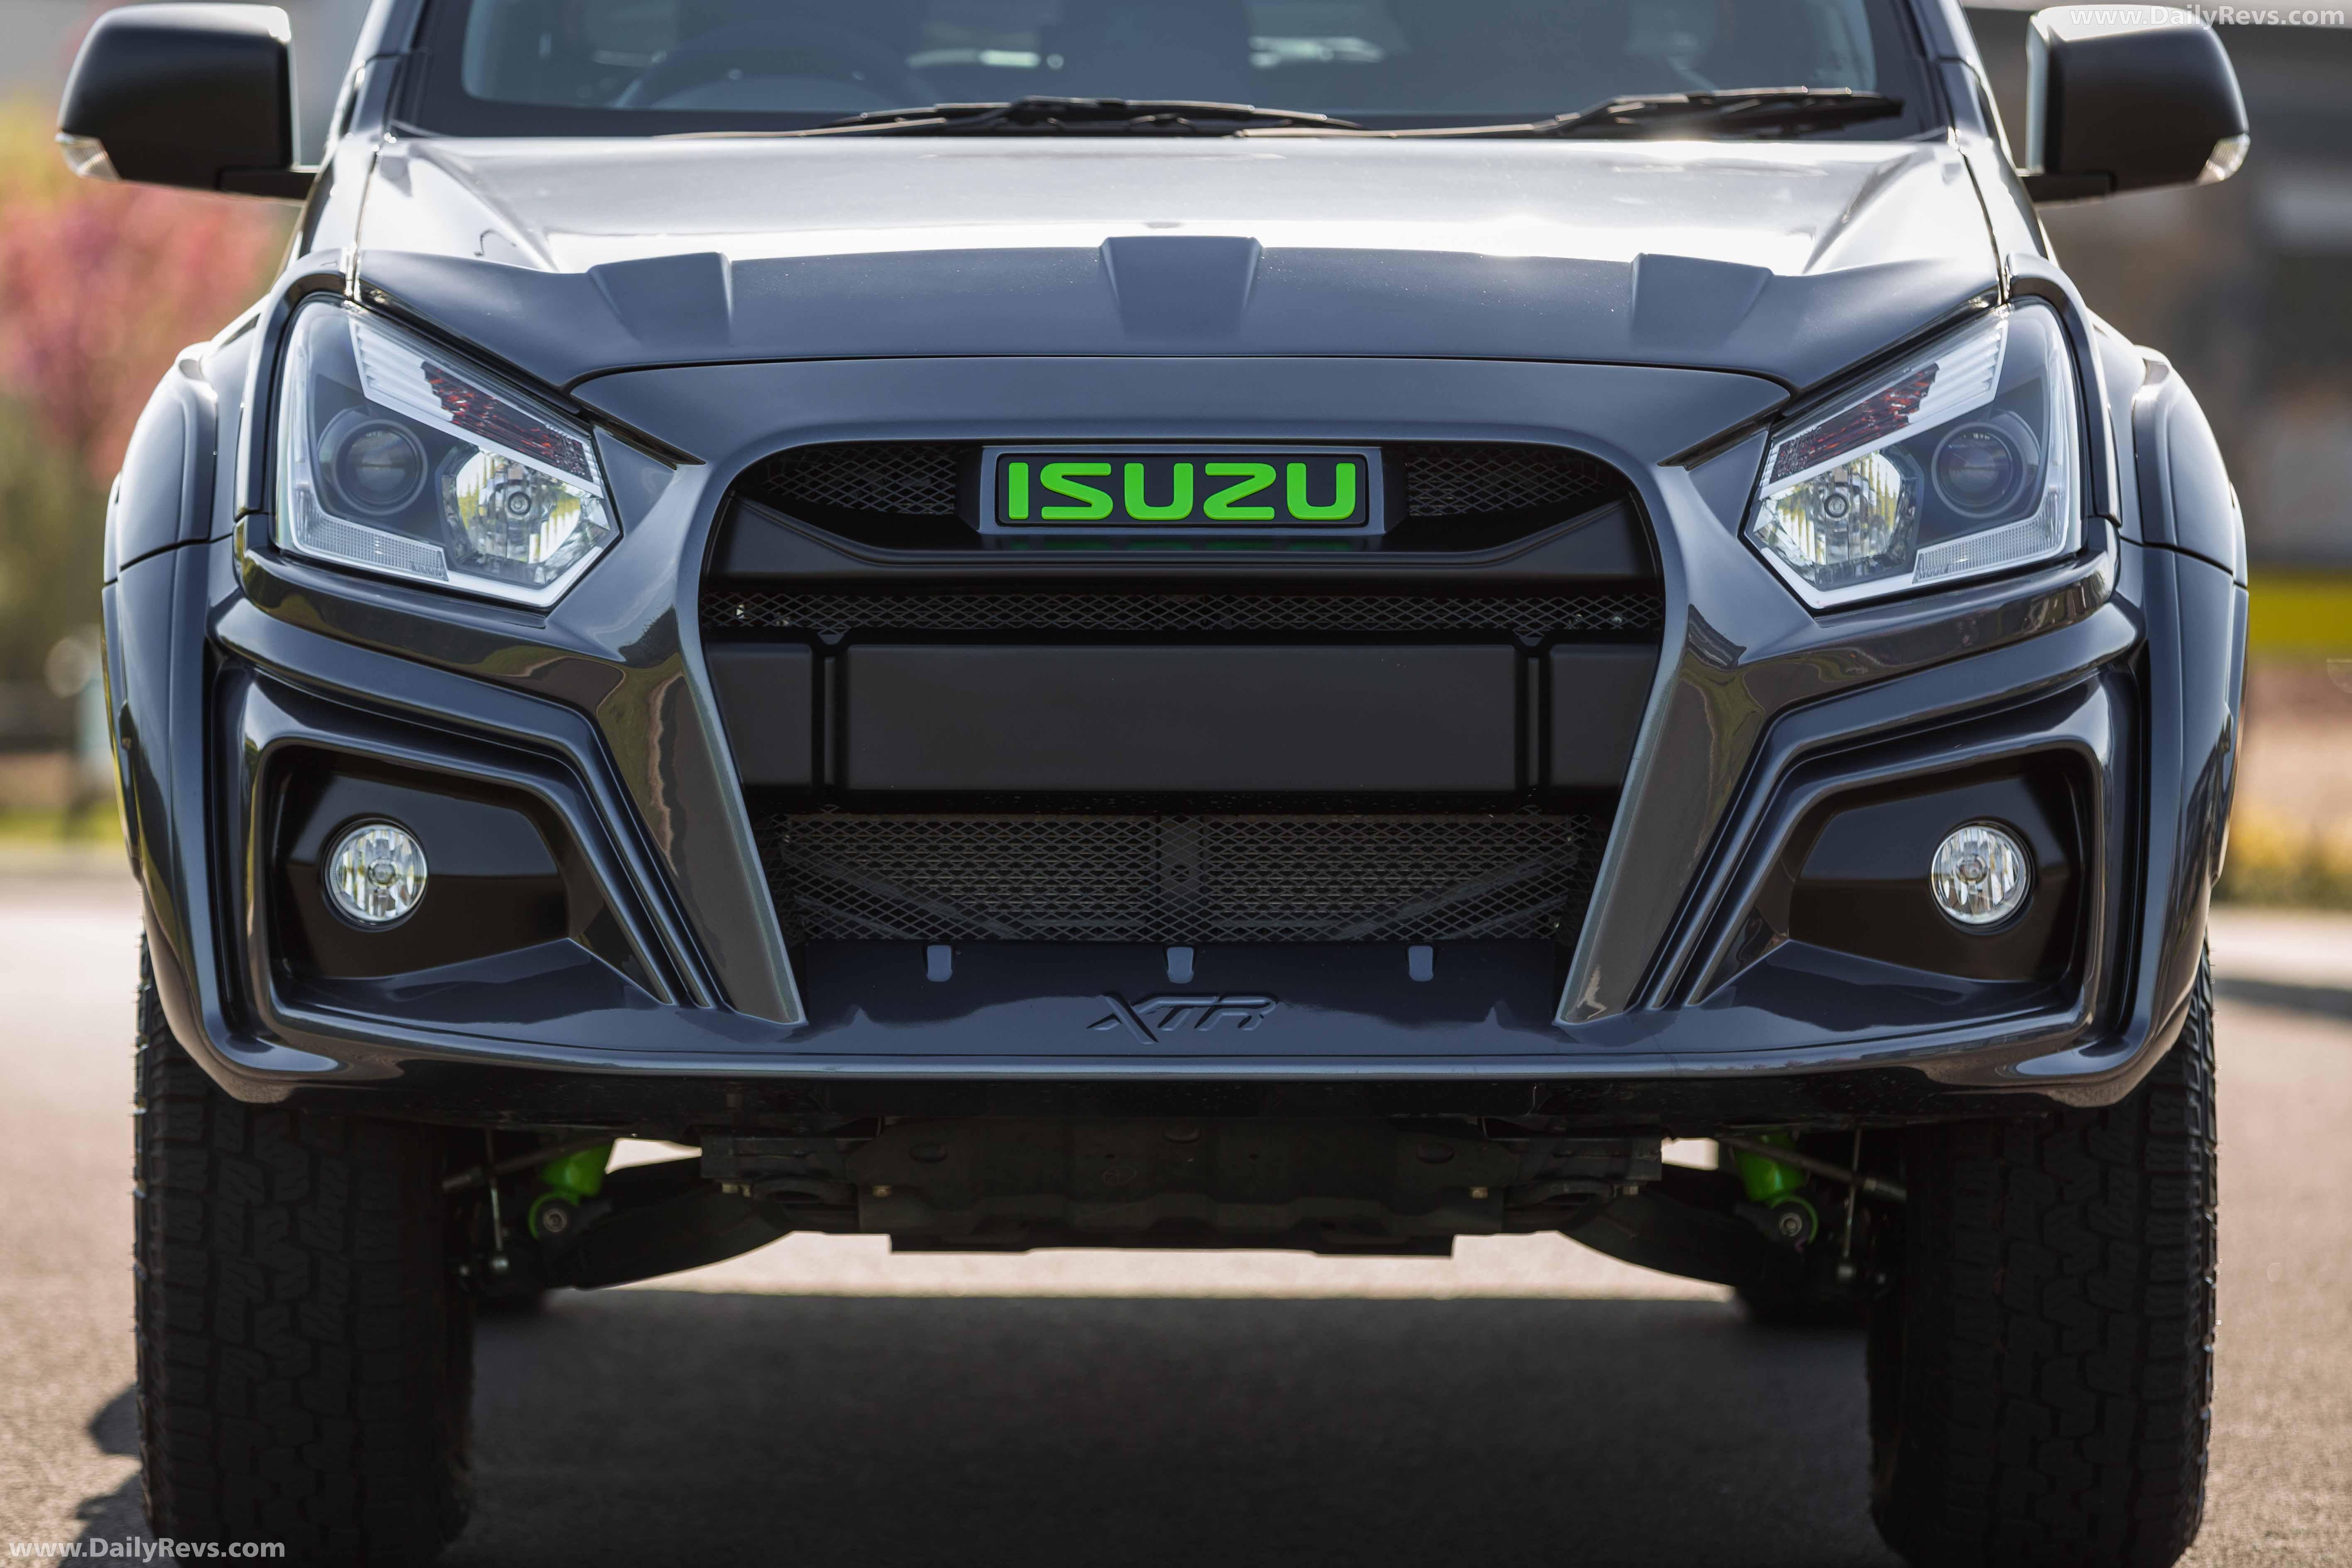 2020 Isuzu D-Max XTR Colour Edition full